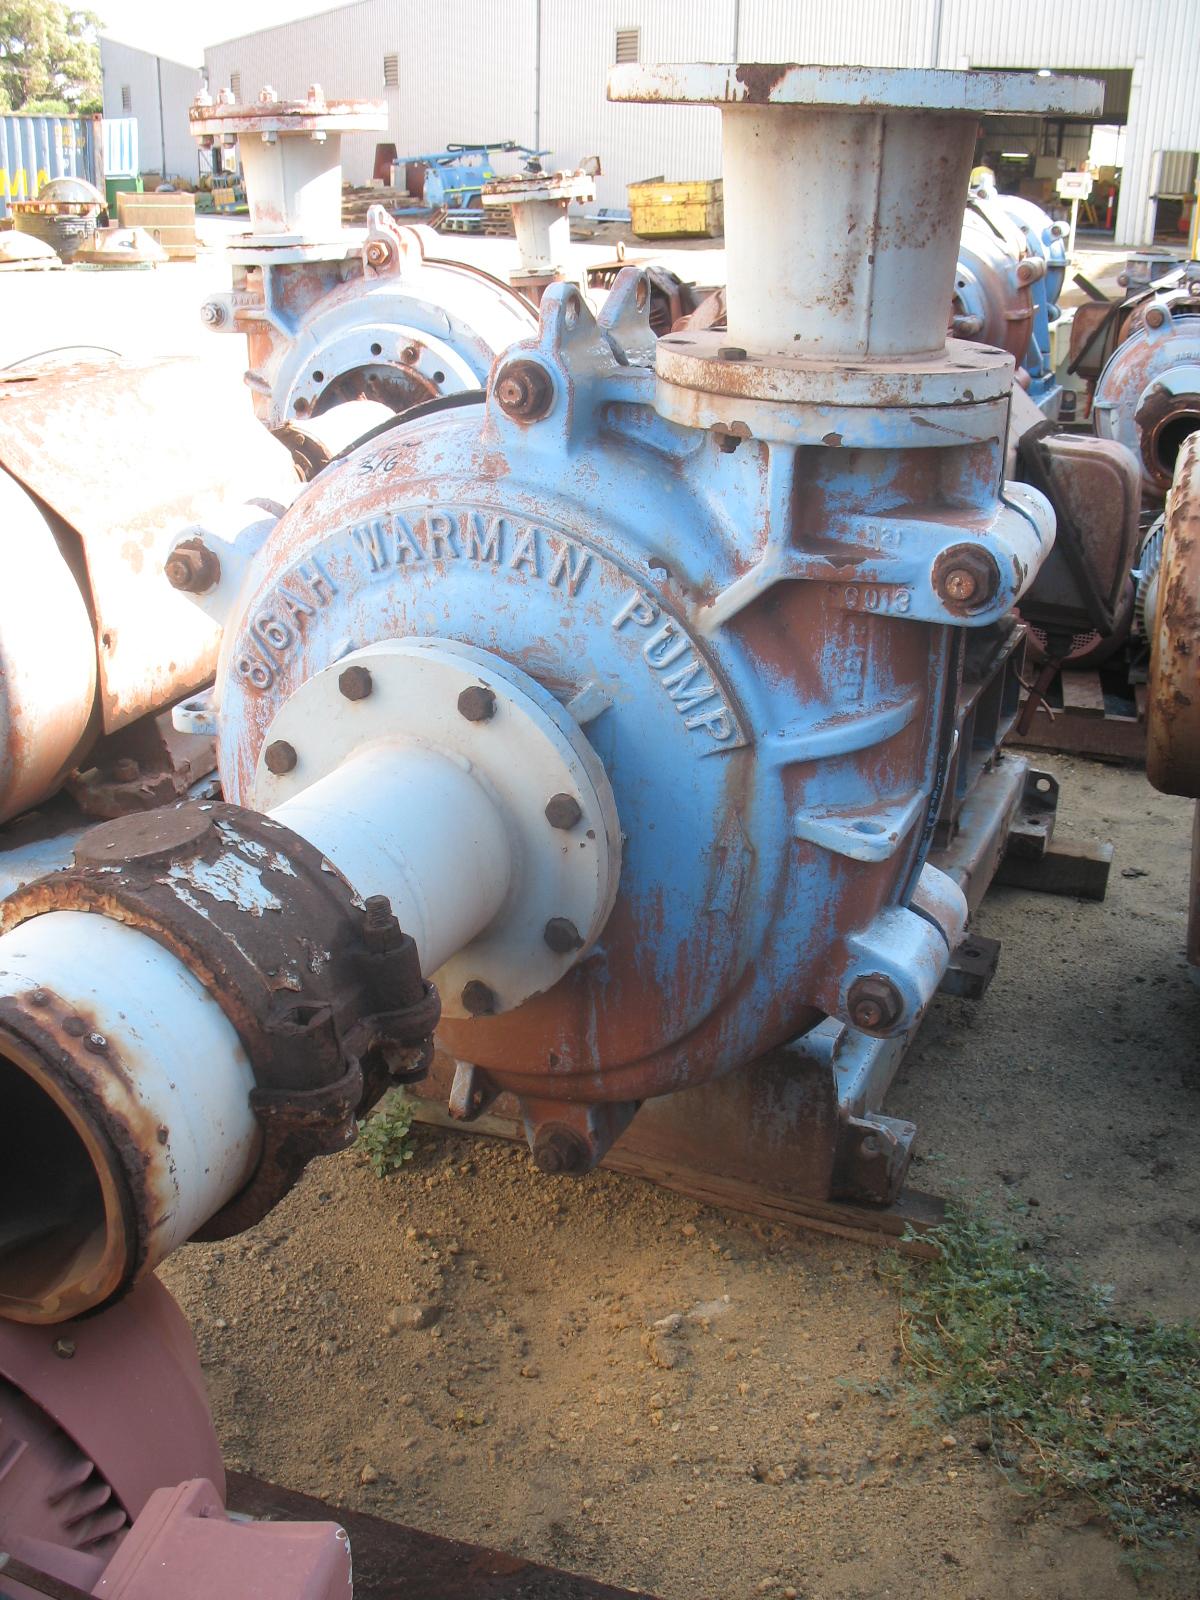 Warman Pump 8 6 Ah Crushing Services International